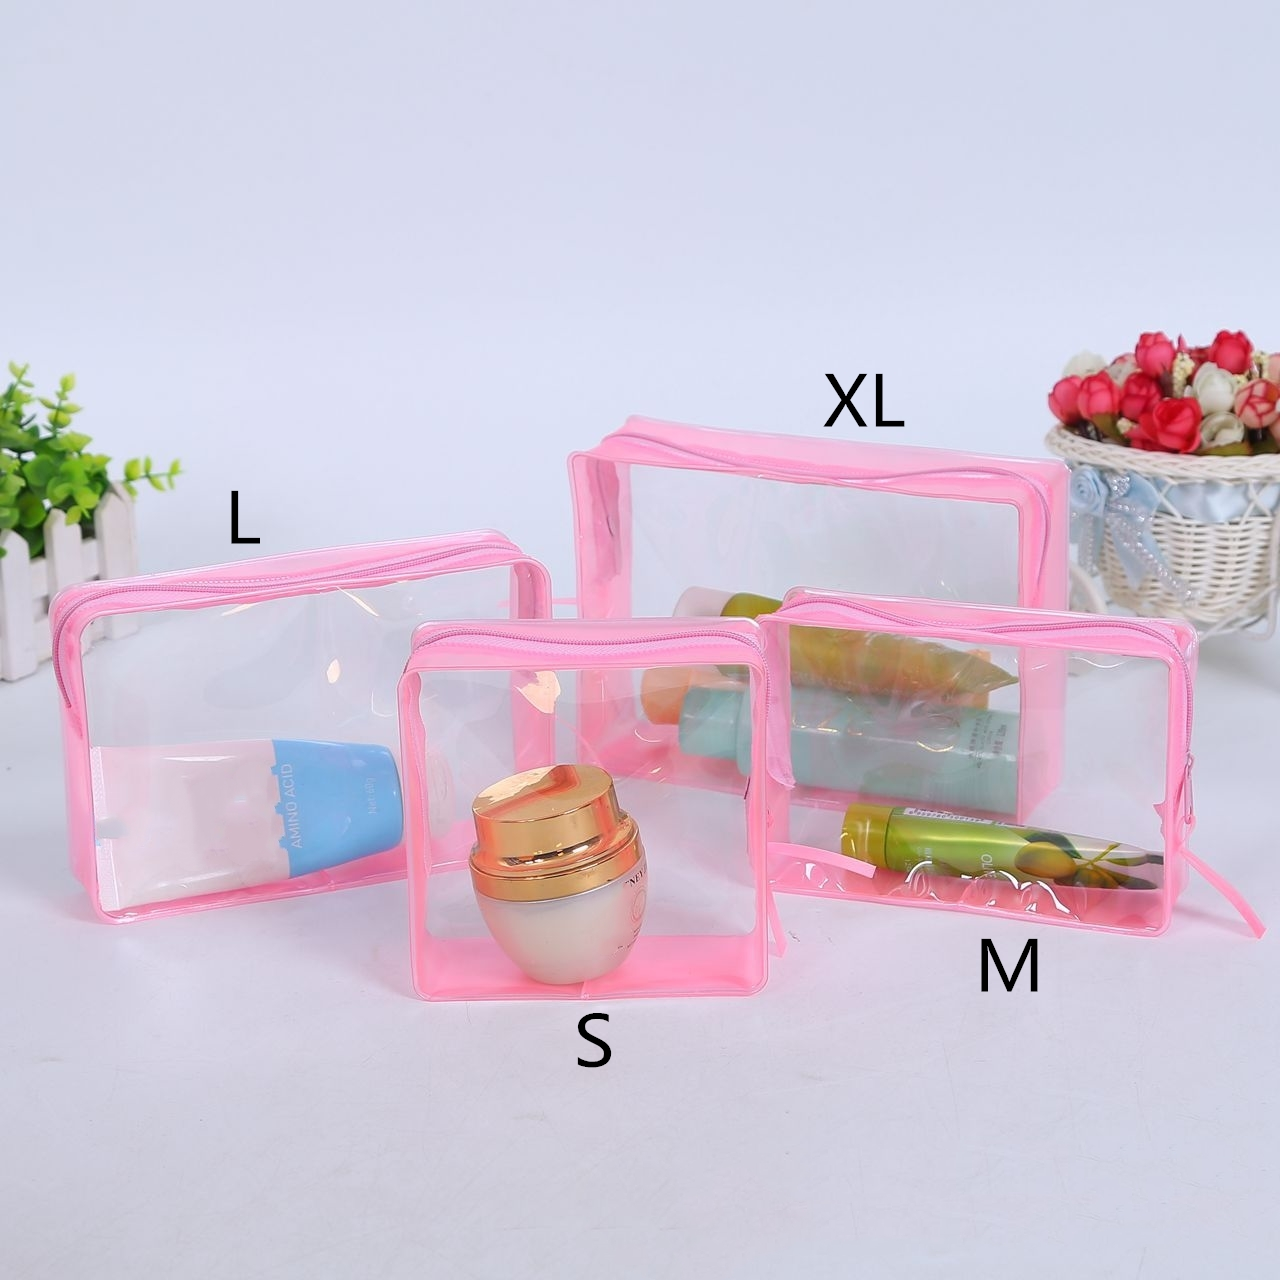 Fashion PVC Travel Cosmetic Bag Women Transparent Waterproof Beauty Neceser Toiletry Bath Wash Make Up Bag Case Organizer